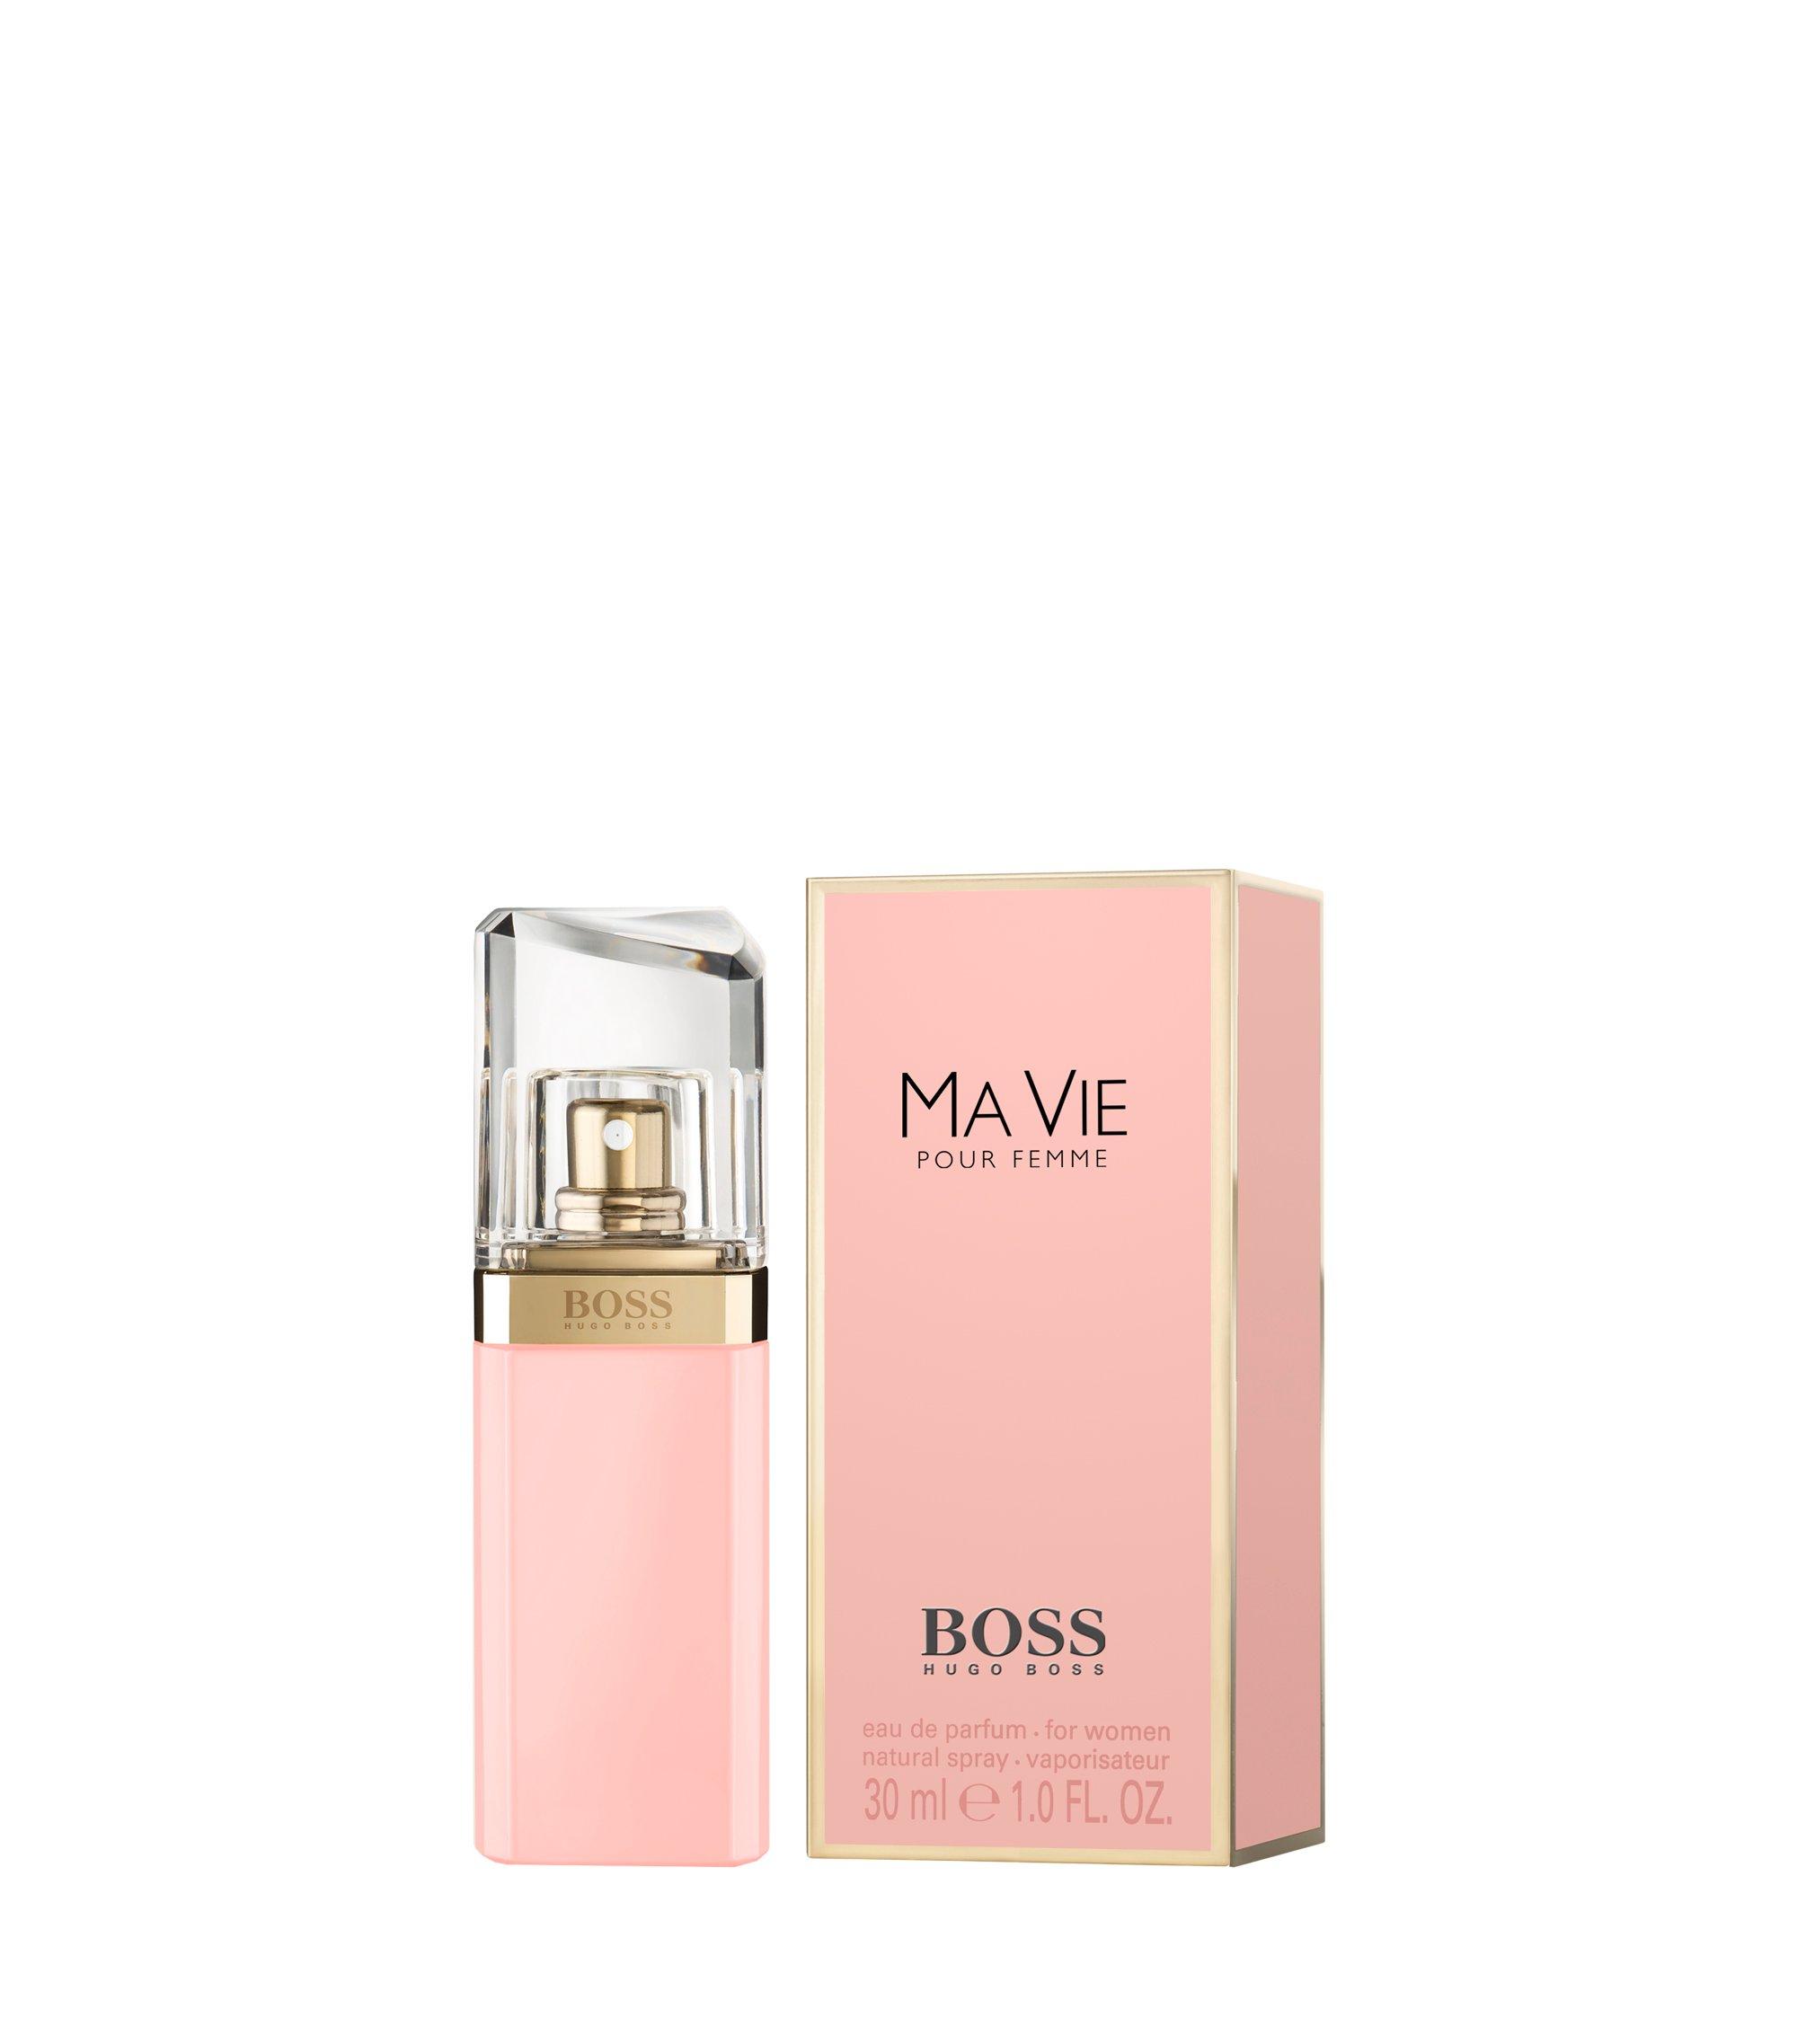 Eau de parfum BOSS Ma Vie pour femme da 30ml, Assorted-Pre-Pack